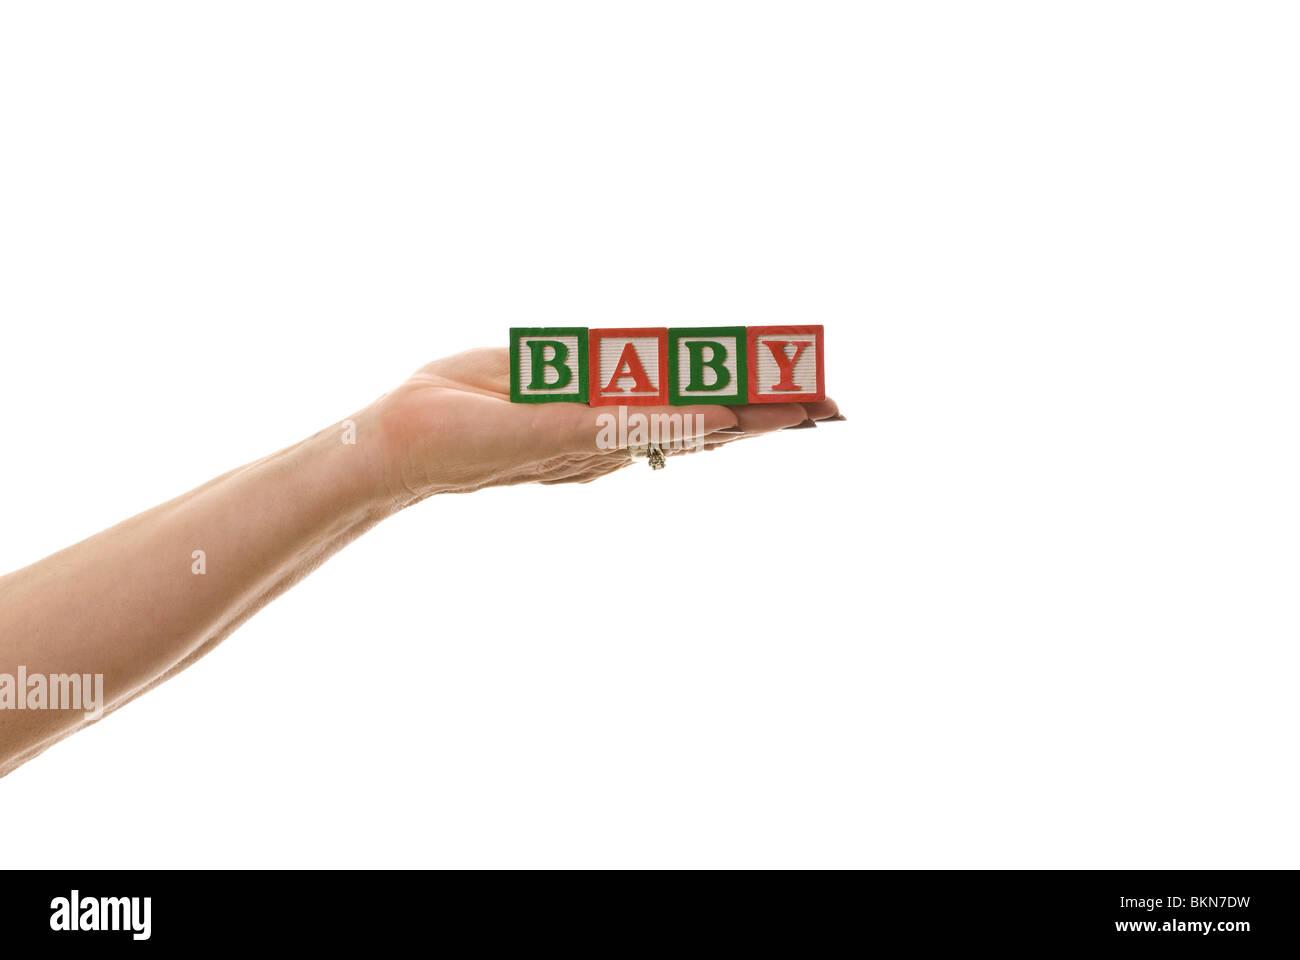 Woman holding children's blocks that spell 'BABY' - Stock Image